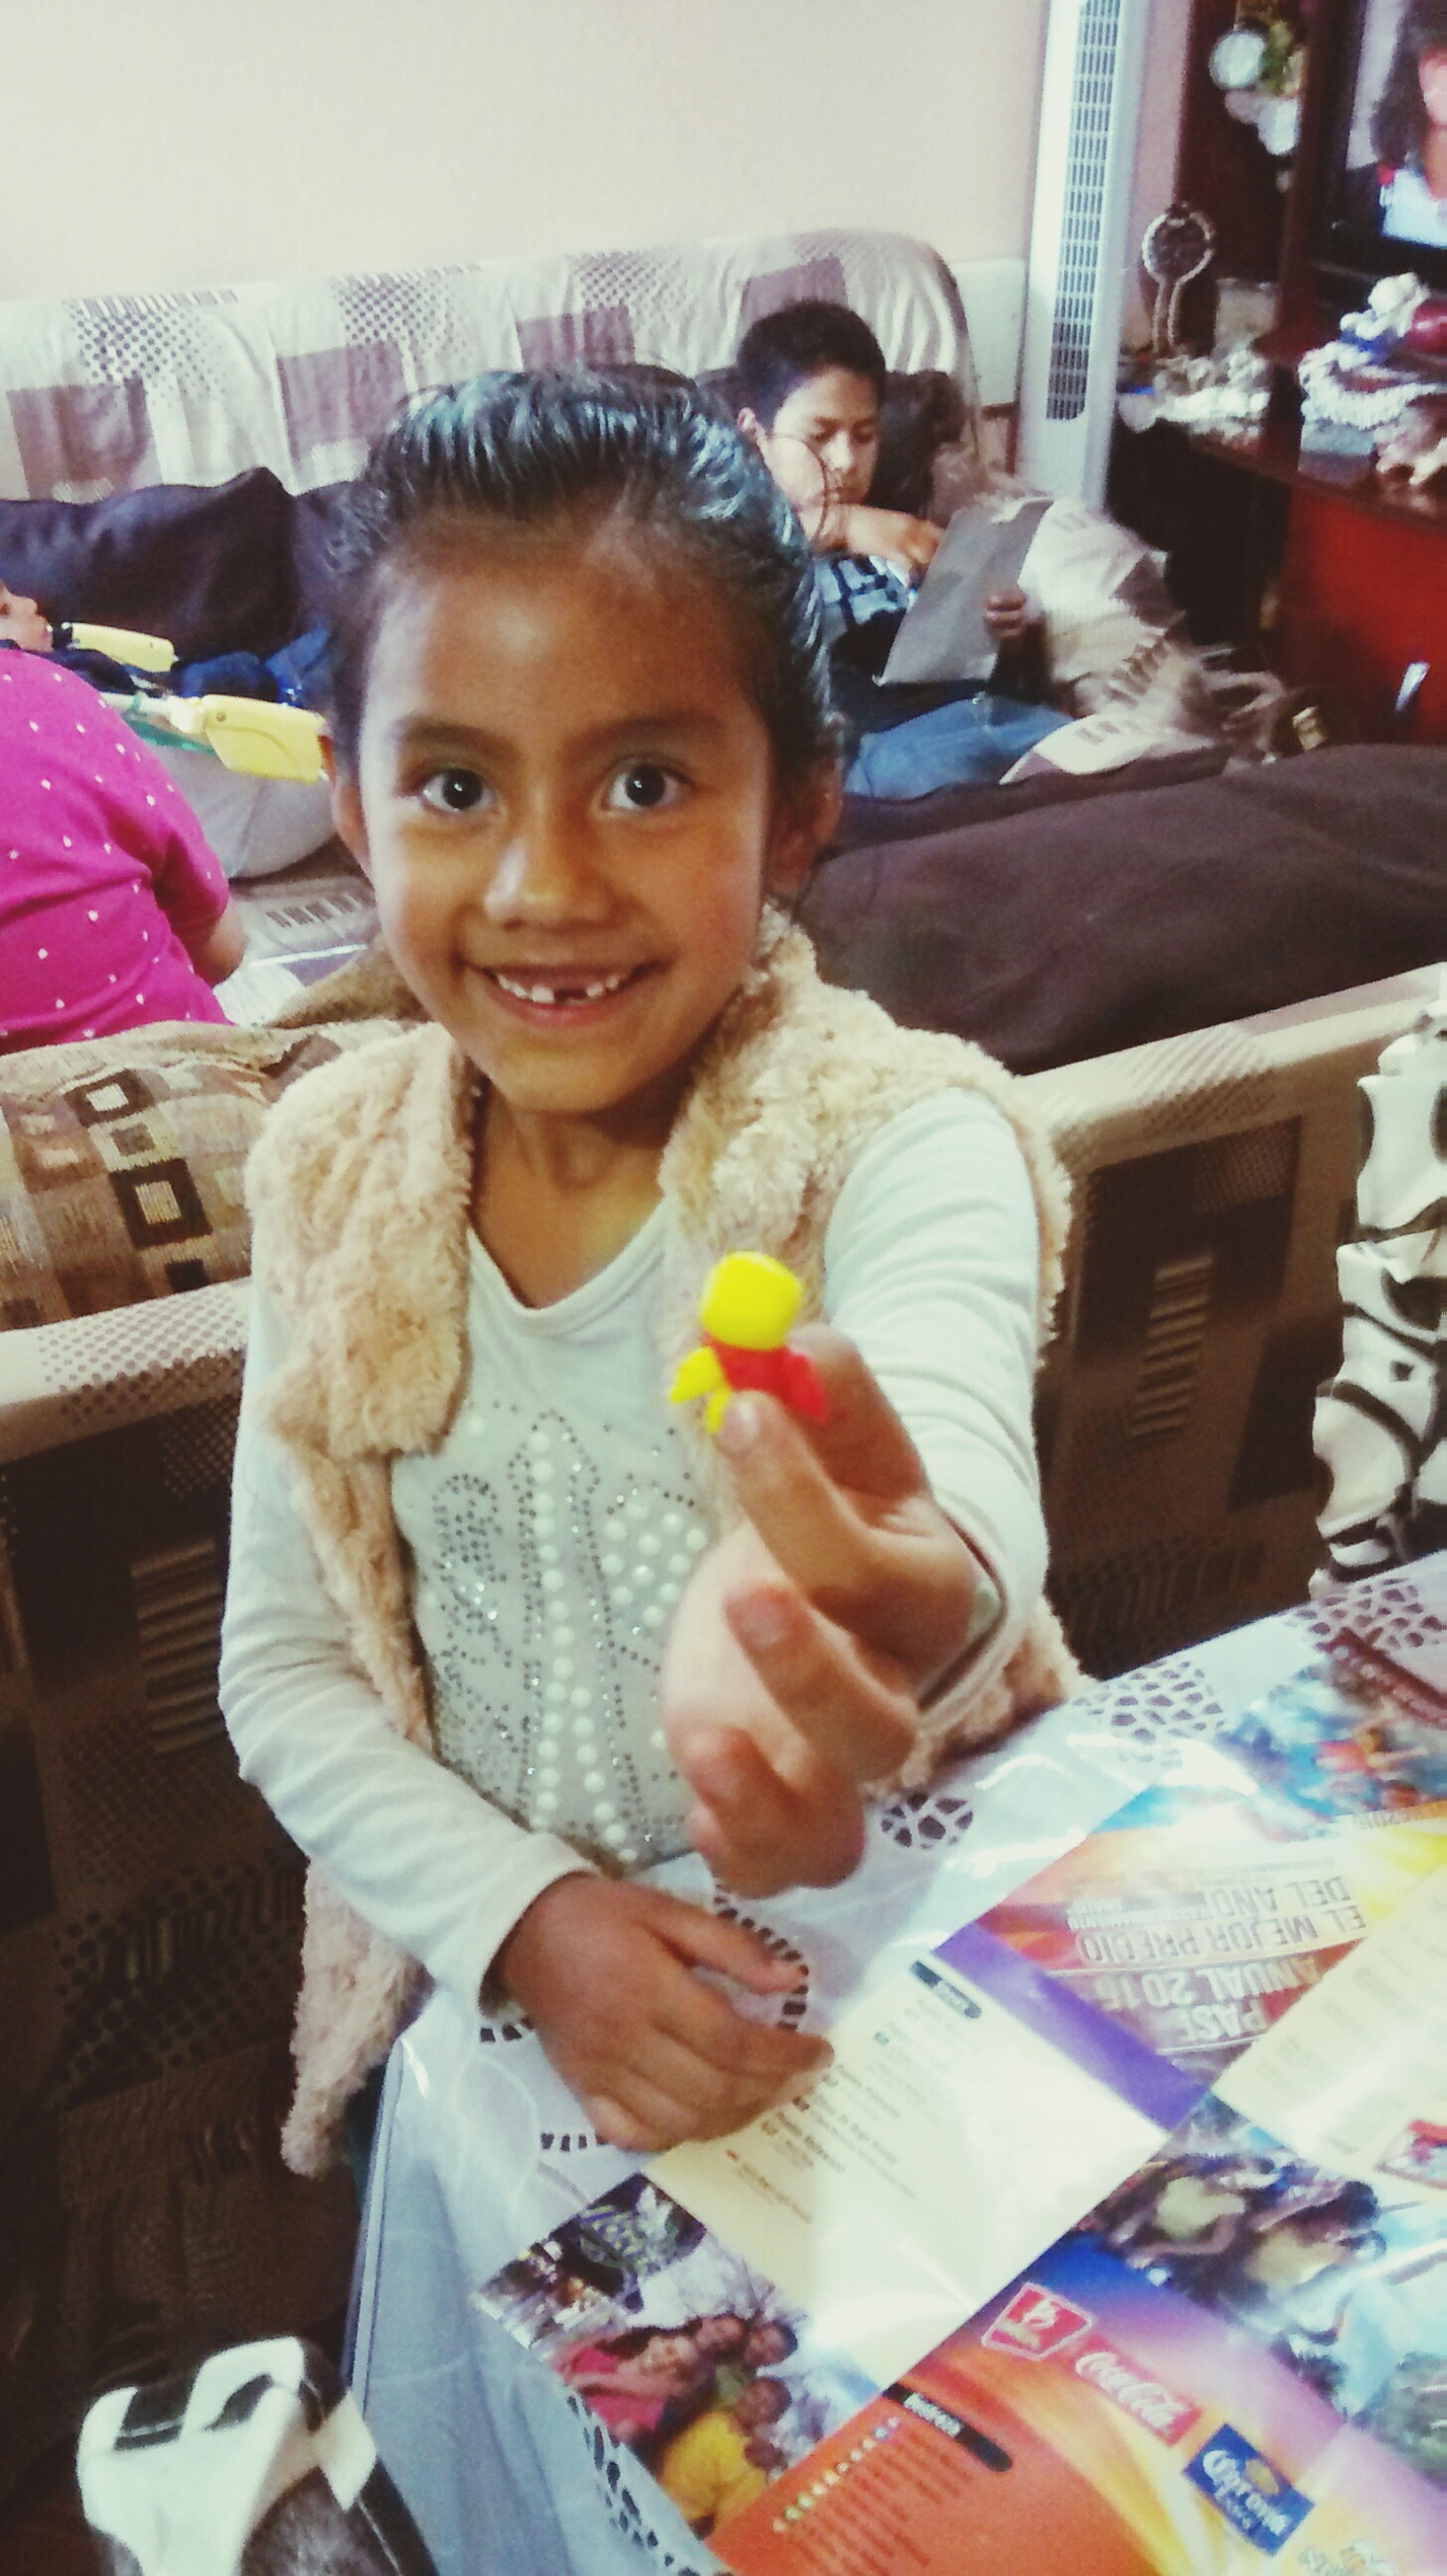 Mi muñekita asiendome un muñko de dulce k linda!!!!!!